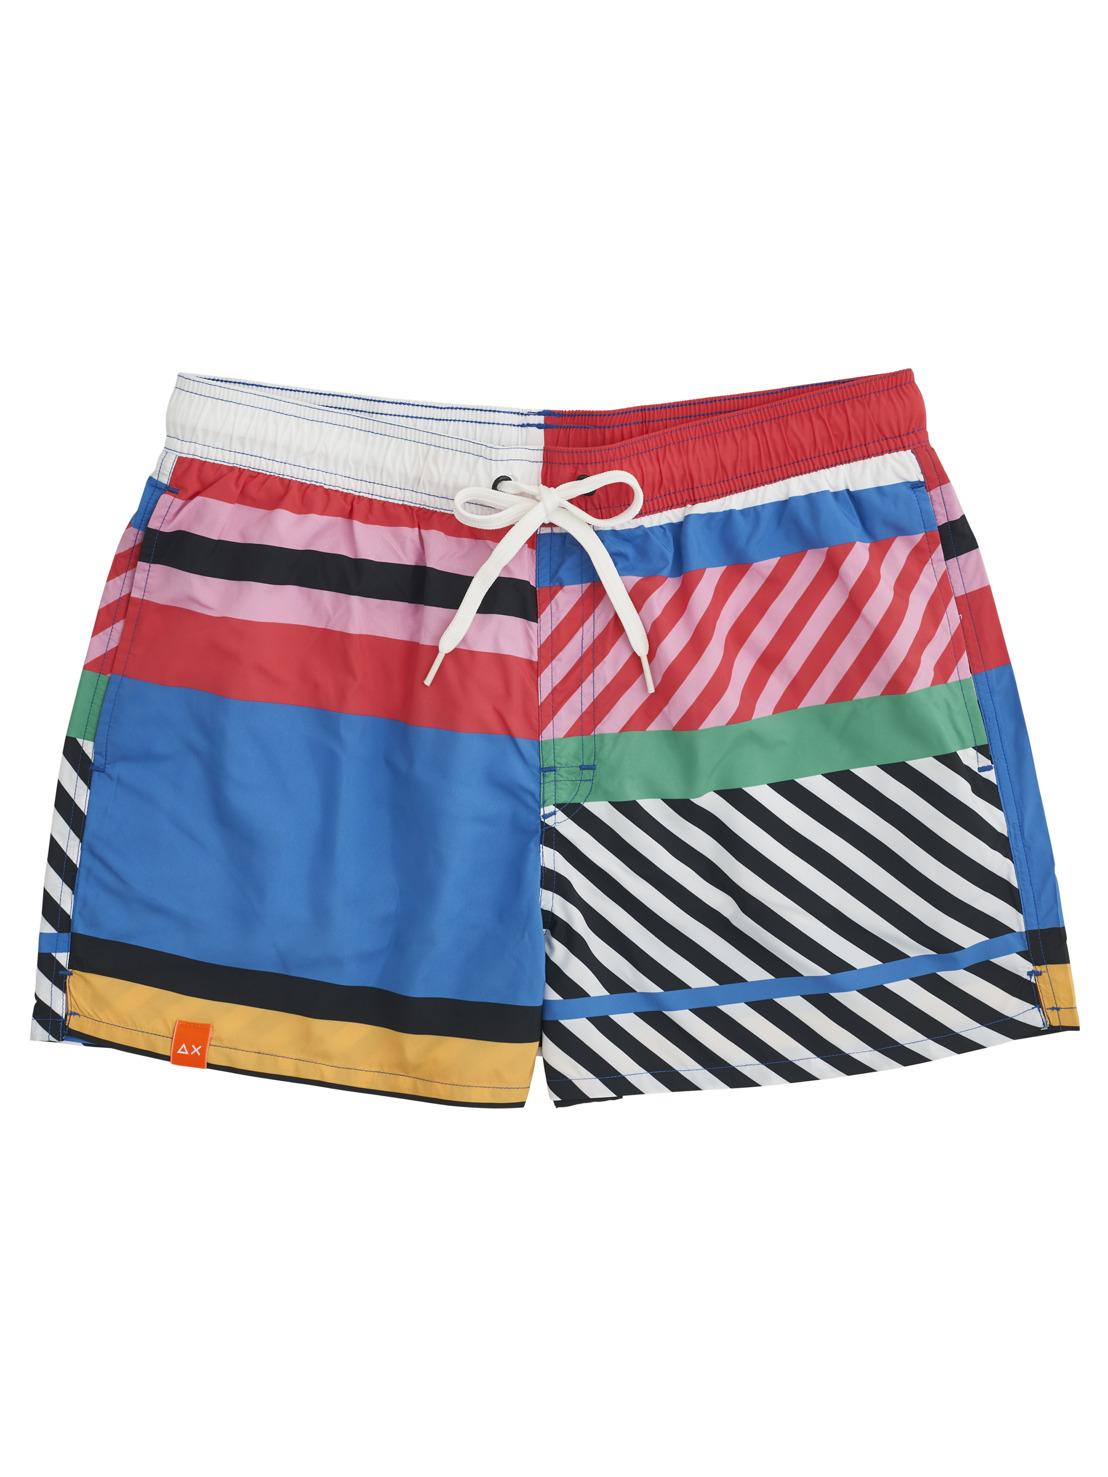 SUN68 SS21 men & boys beachwear| packshots